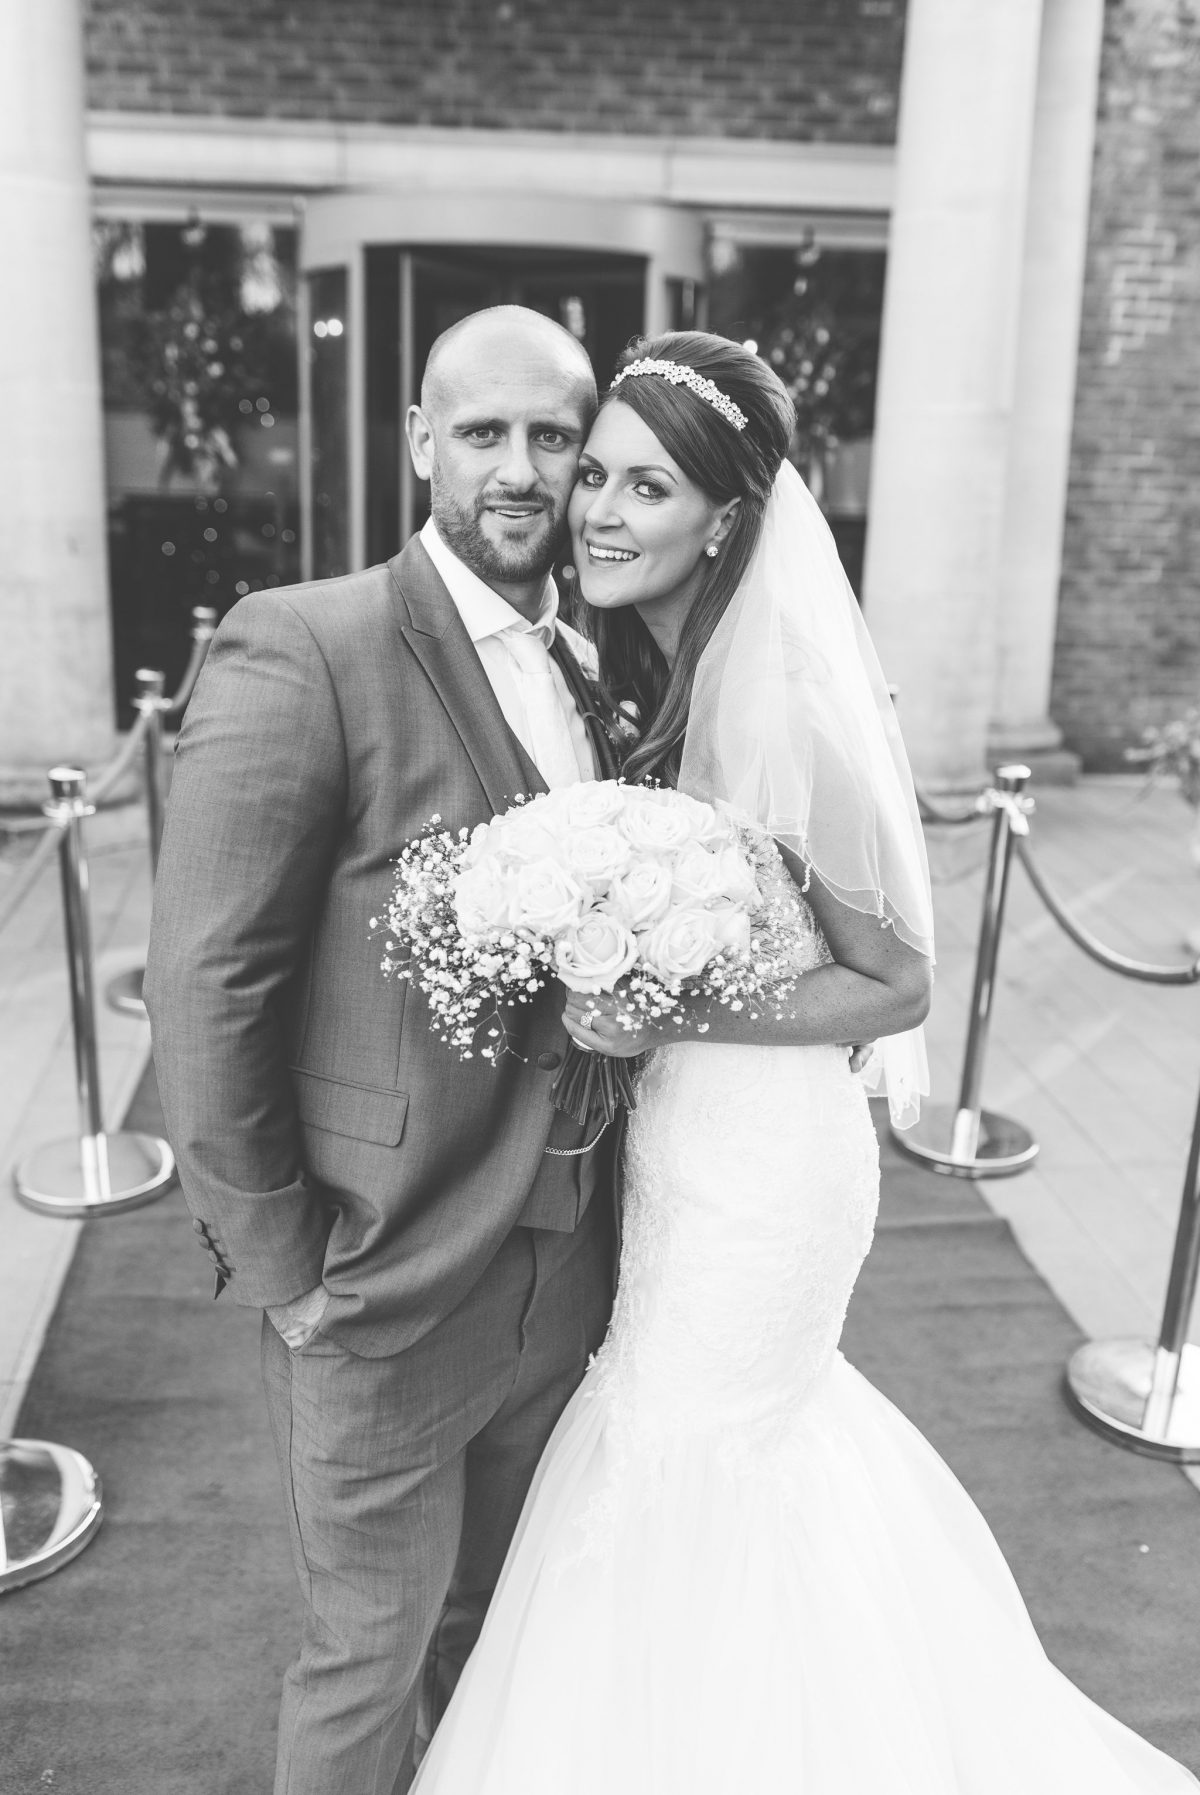 welsh_wedding_photographer_rachel_lambert_photography_decourceys_cardiff_rhiannon_gavin_ 64